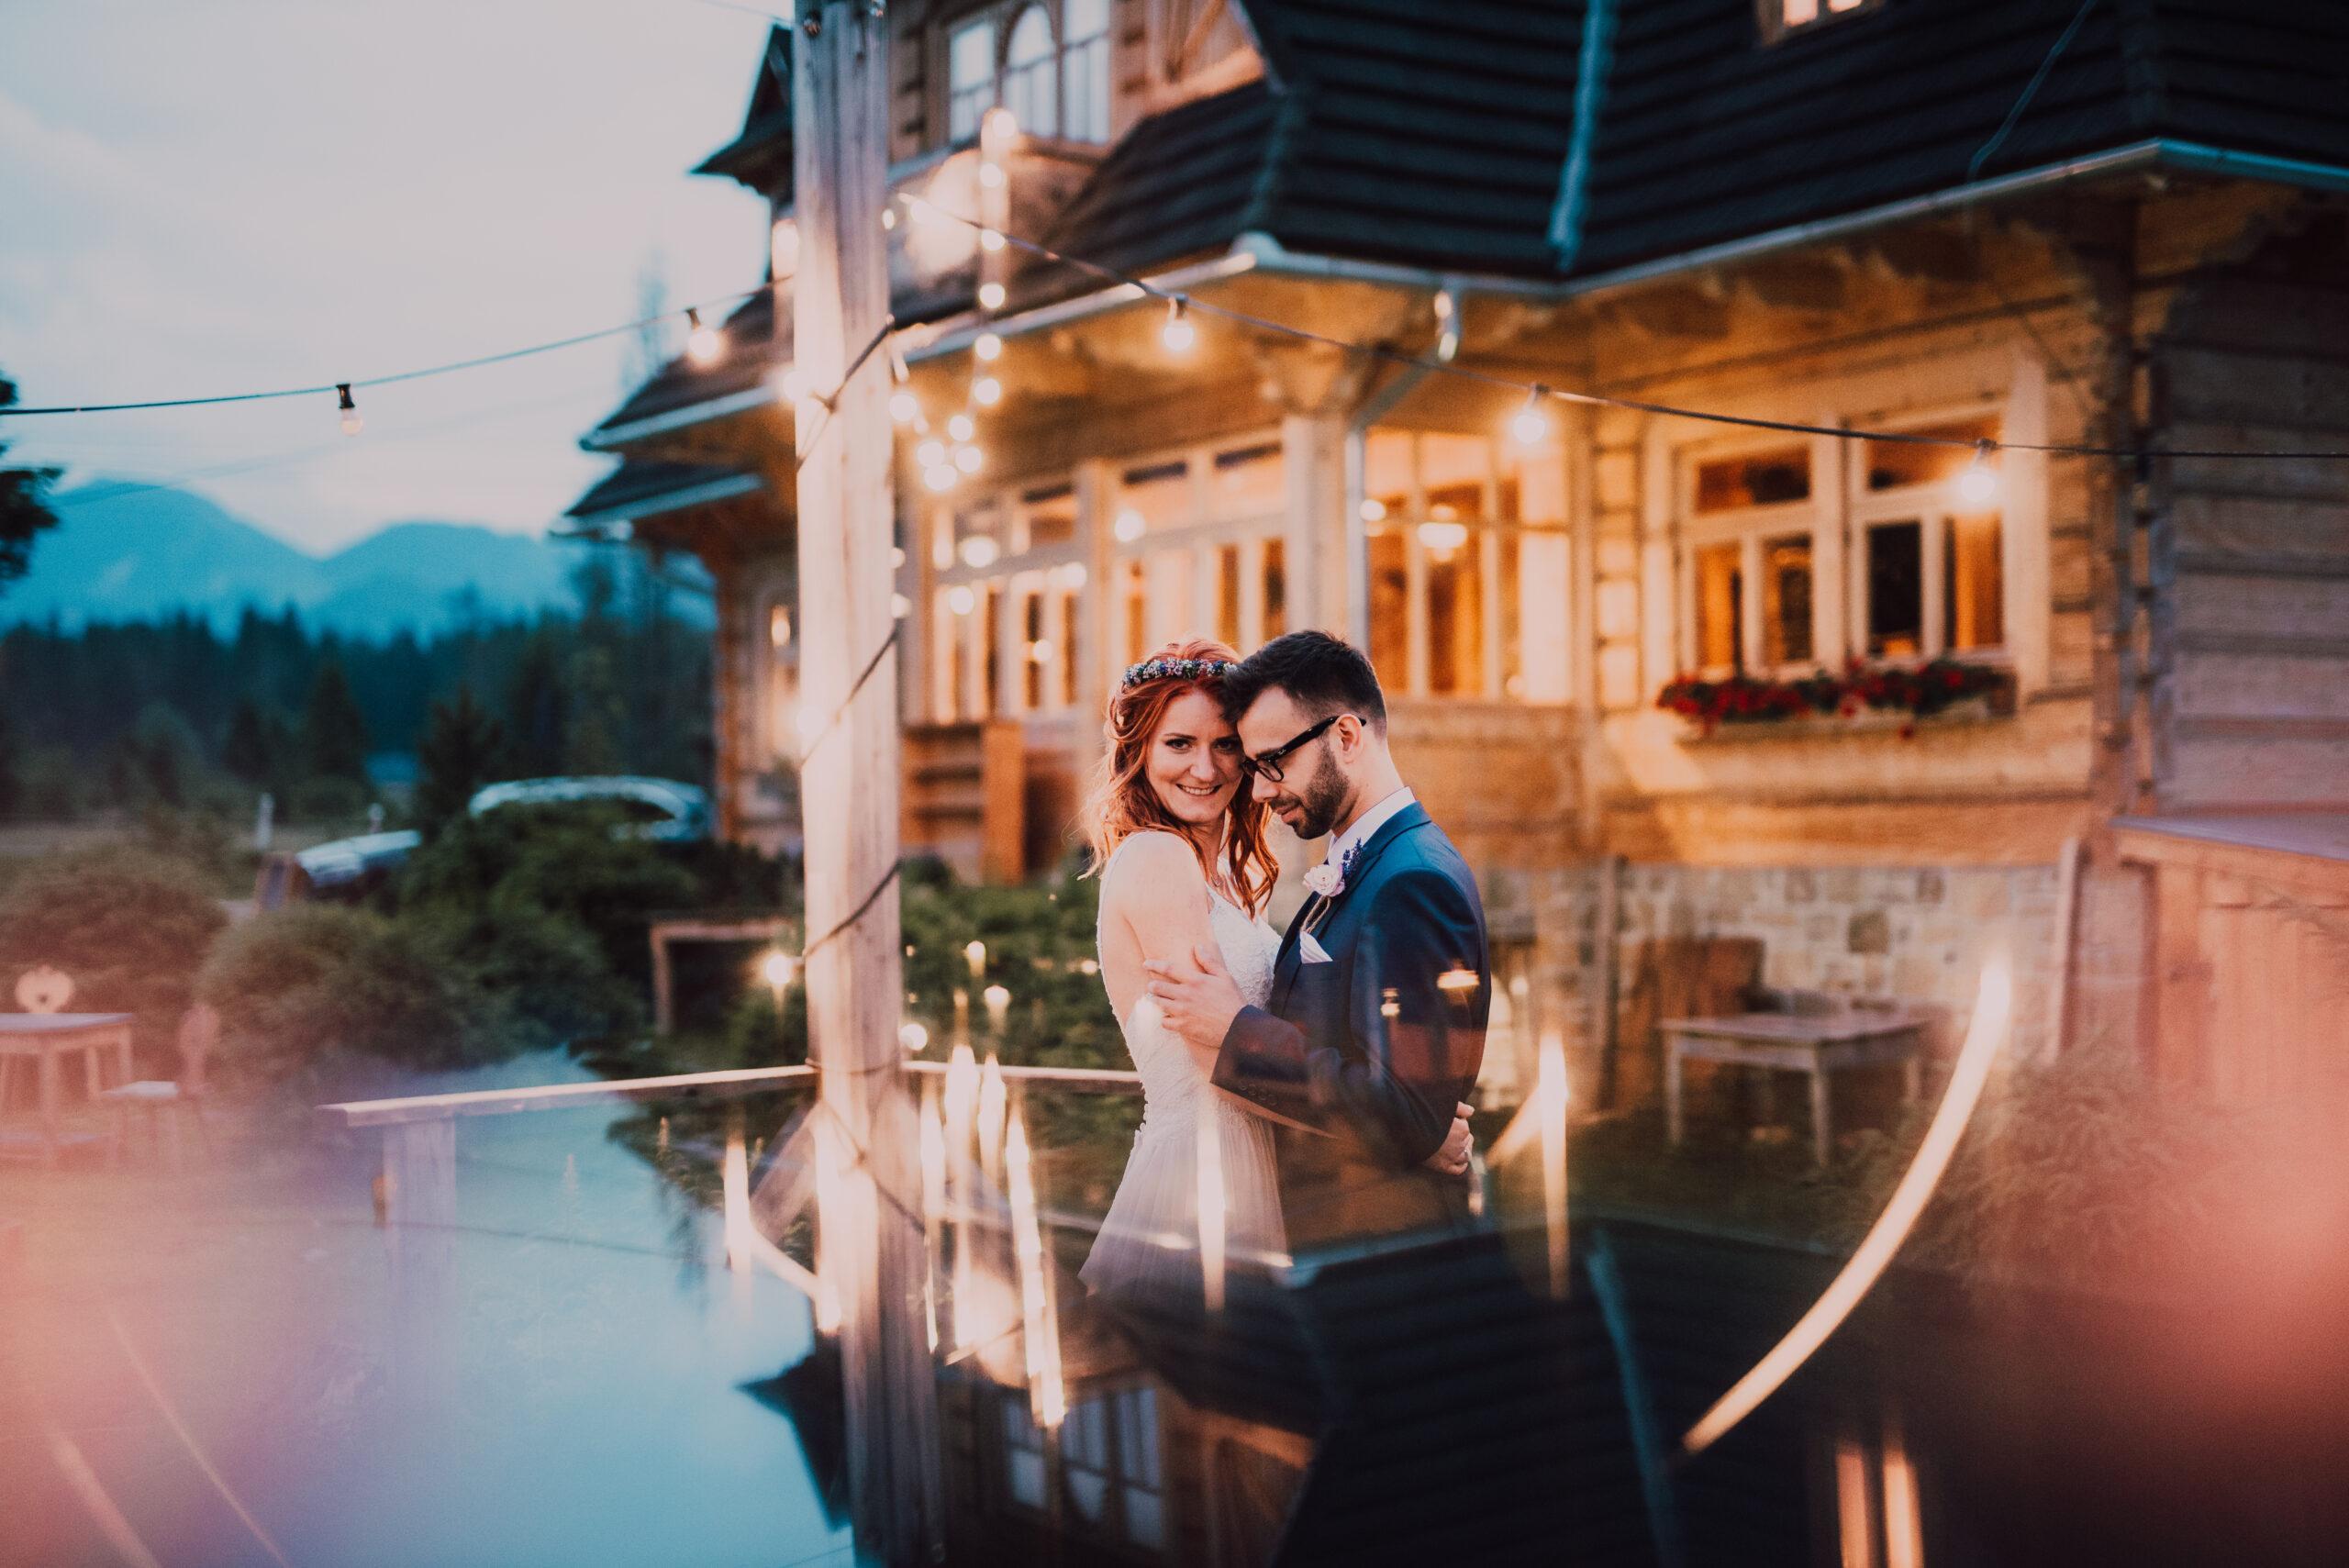 Ślub w górach 10